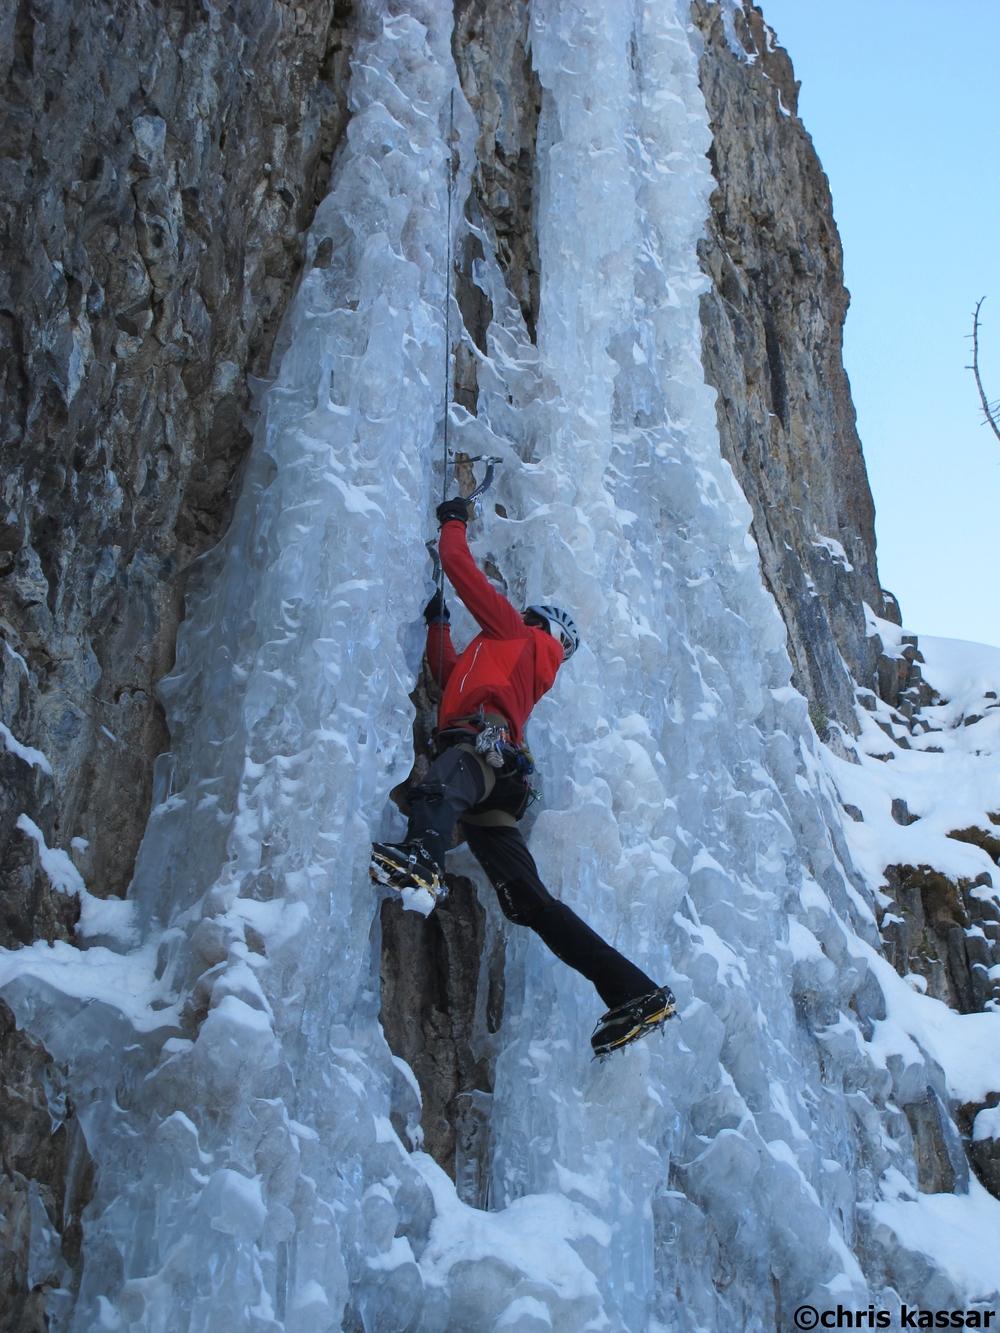 Hyalite_Canyon_Climbing_Ice (2).jpg